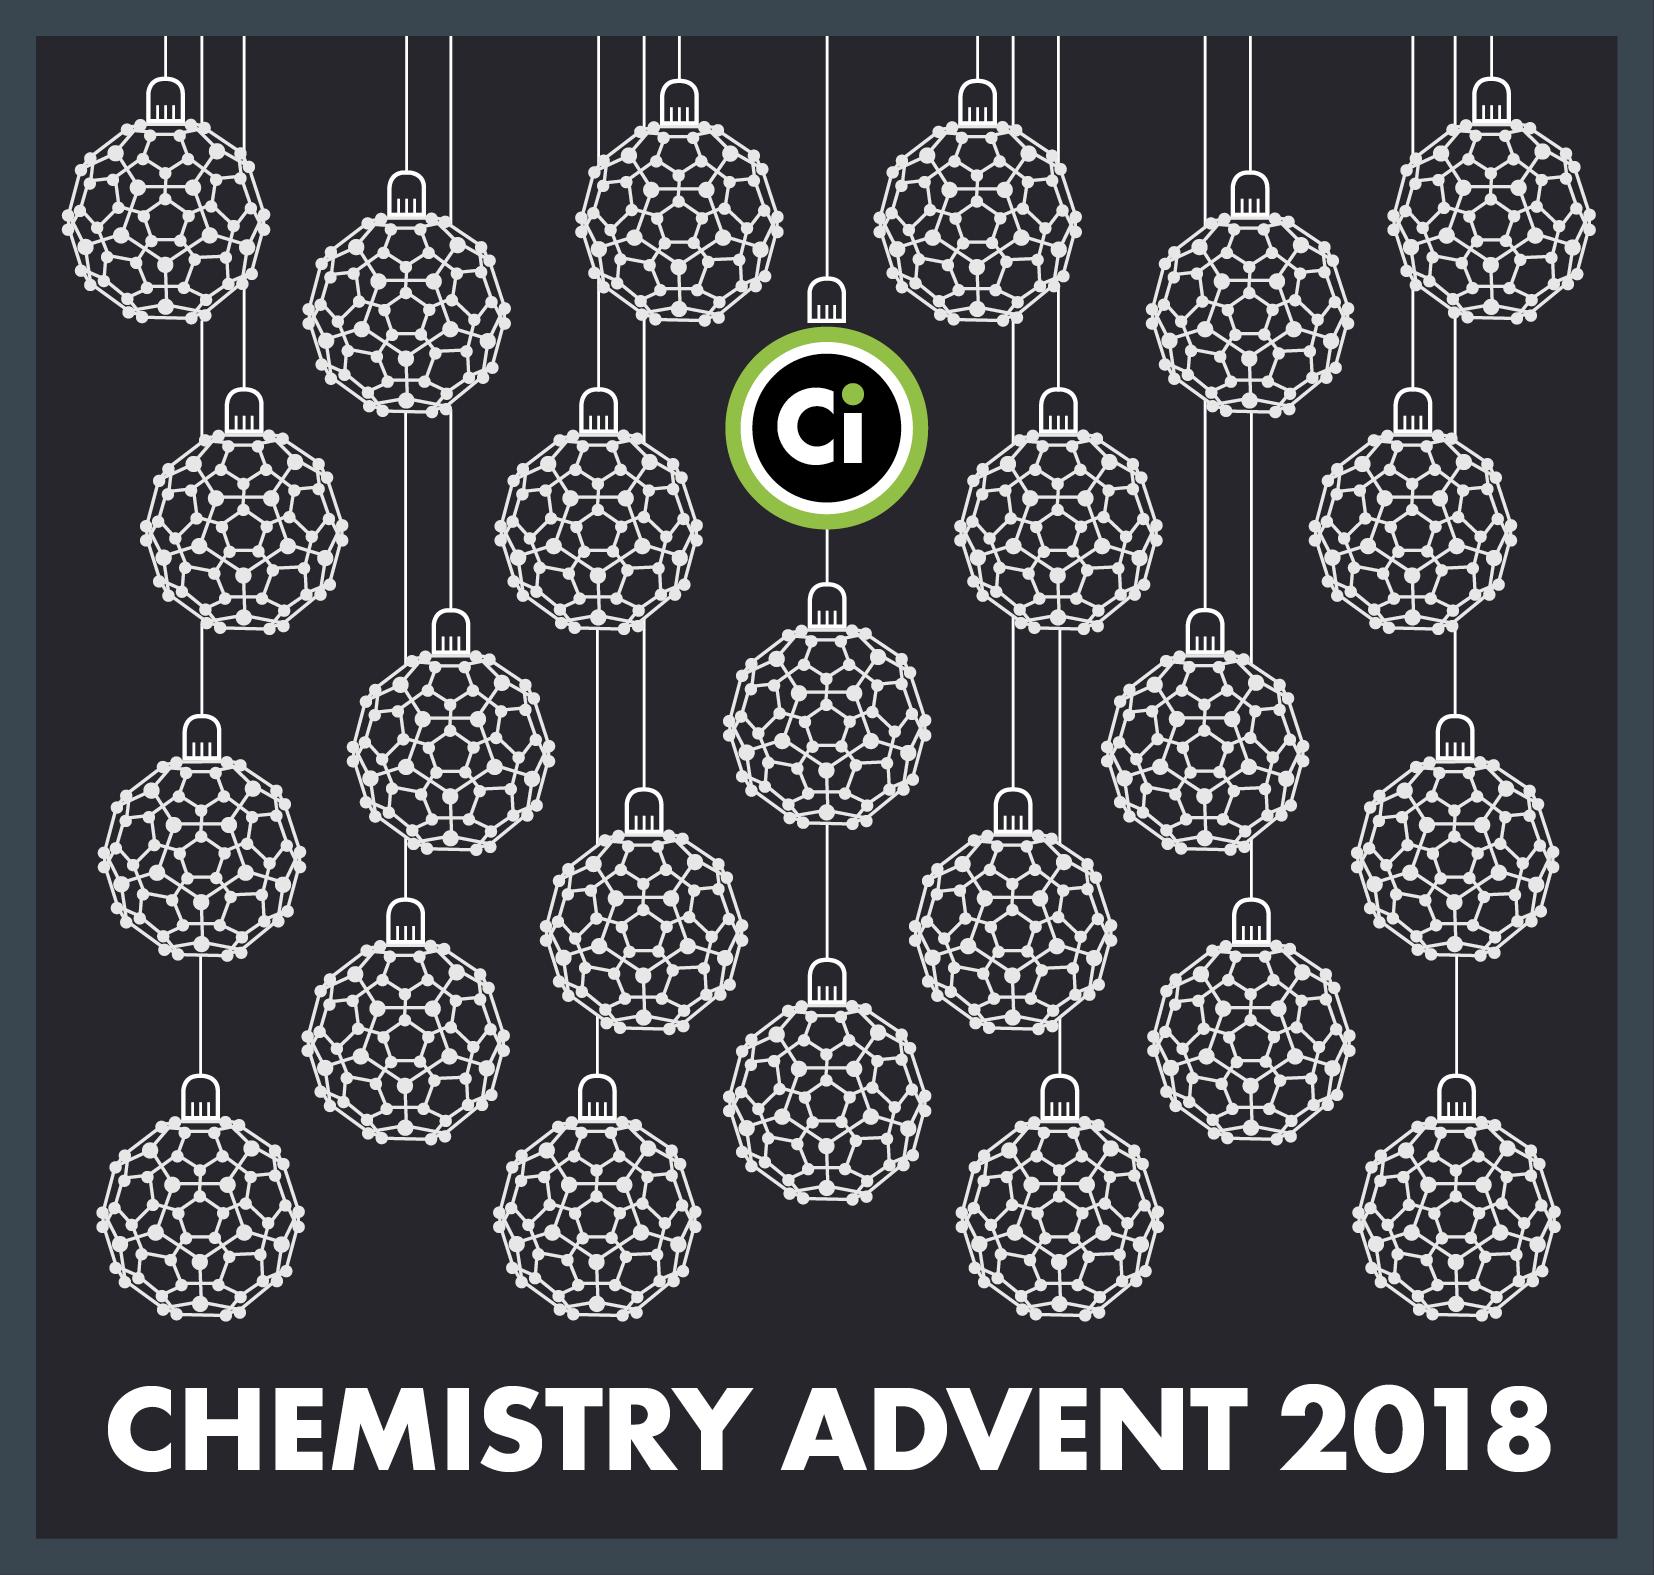 The 2018 Chemistry Advent Calendar